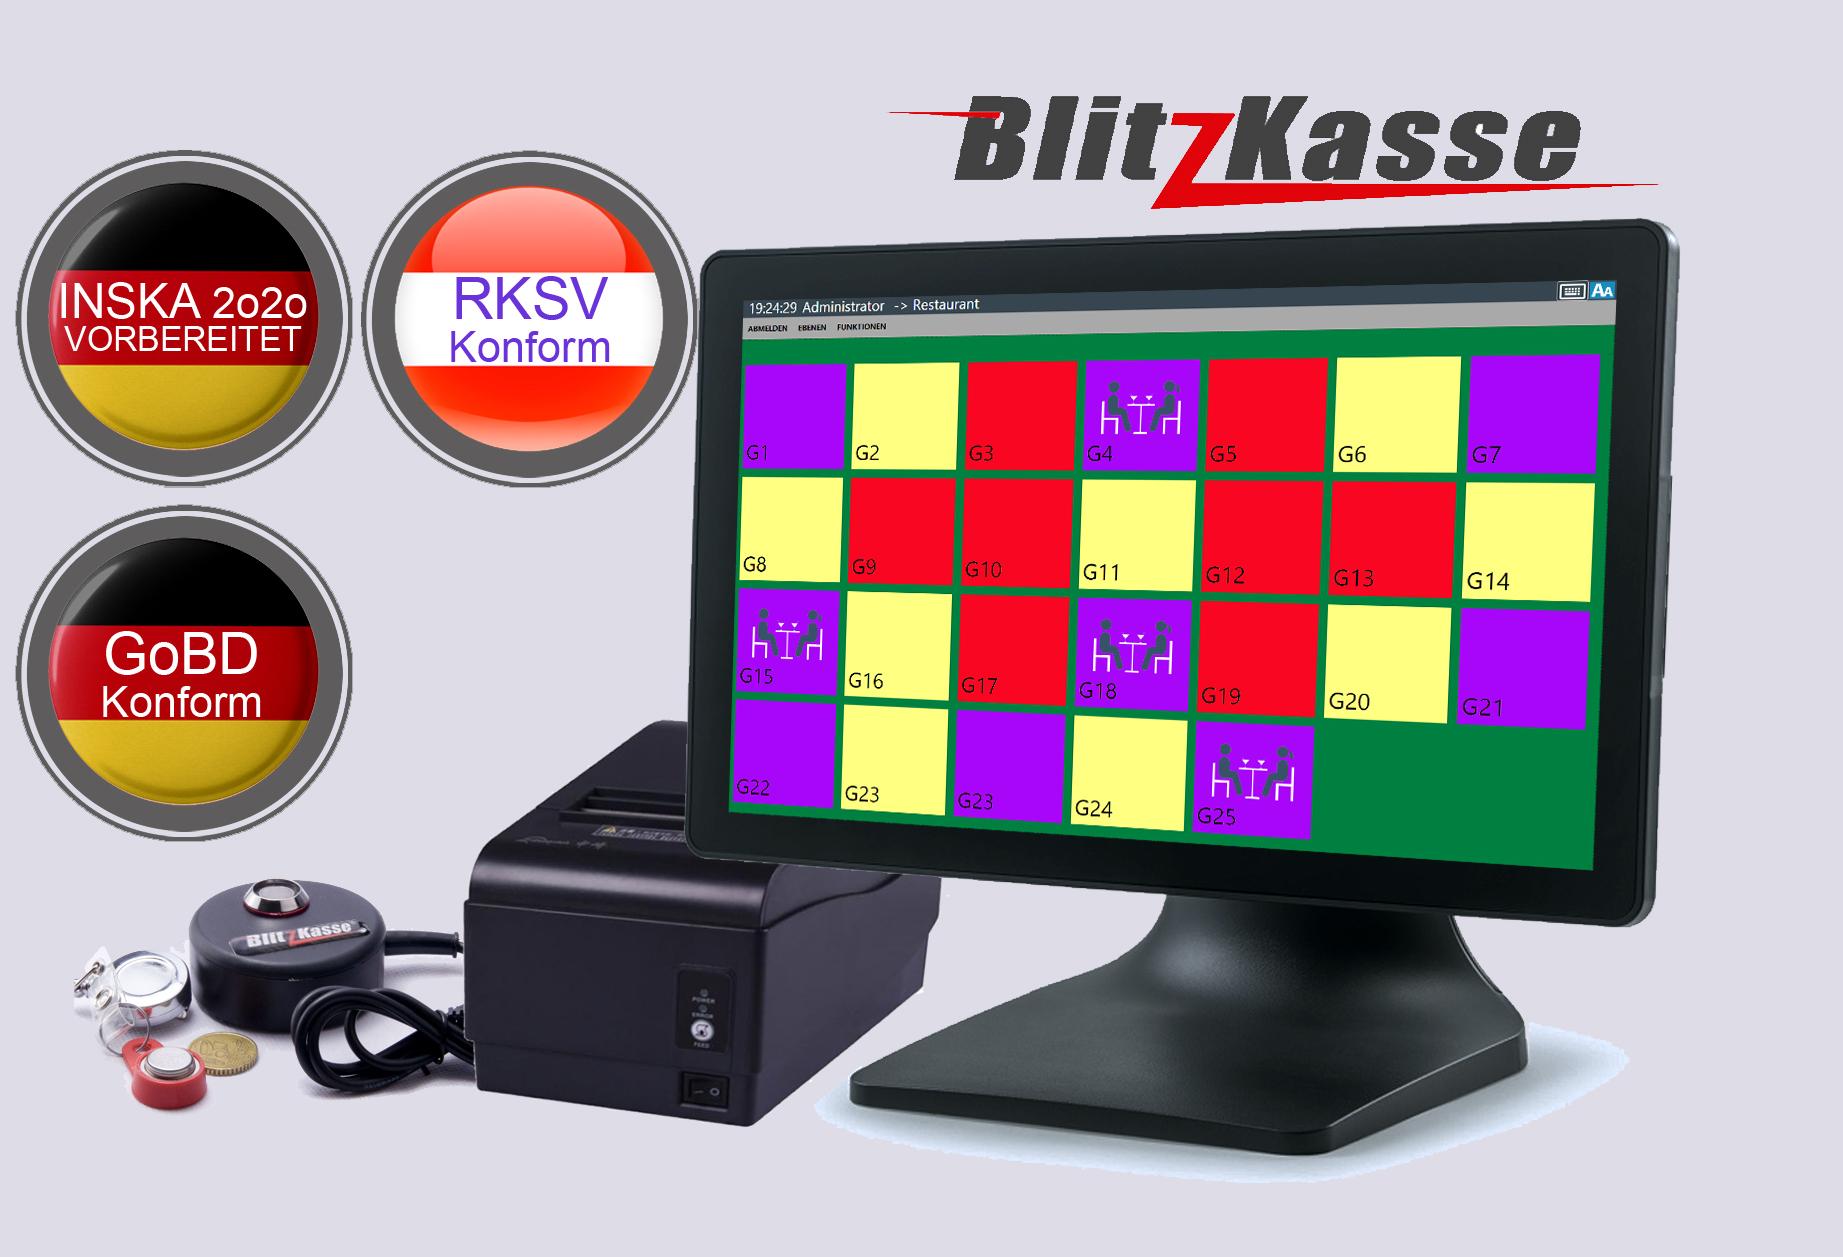 BlitzKasse.de-15.4Zoll-Touch-insika-konform-insikakkasse-01